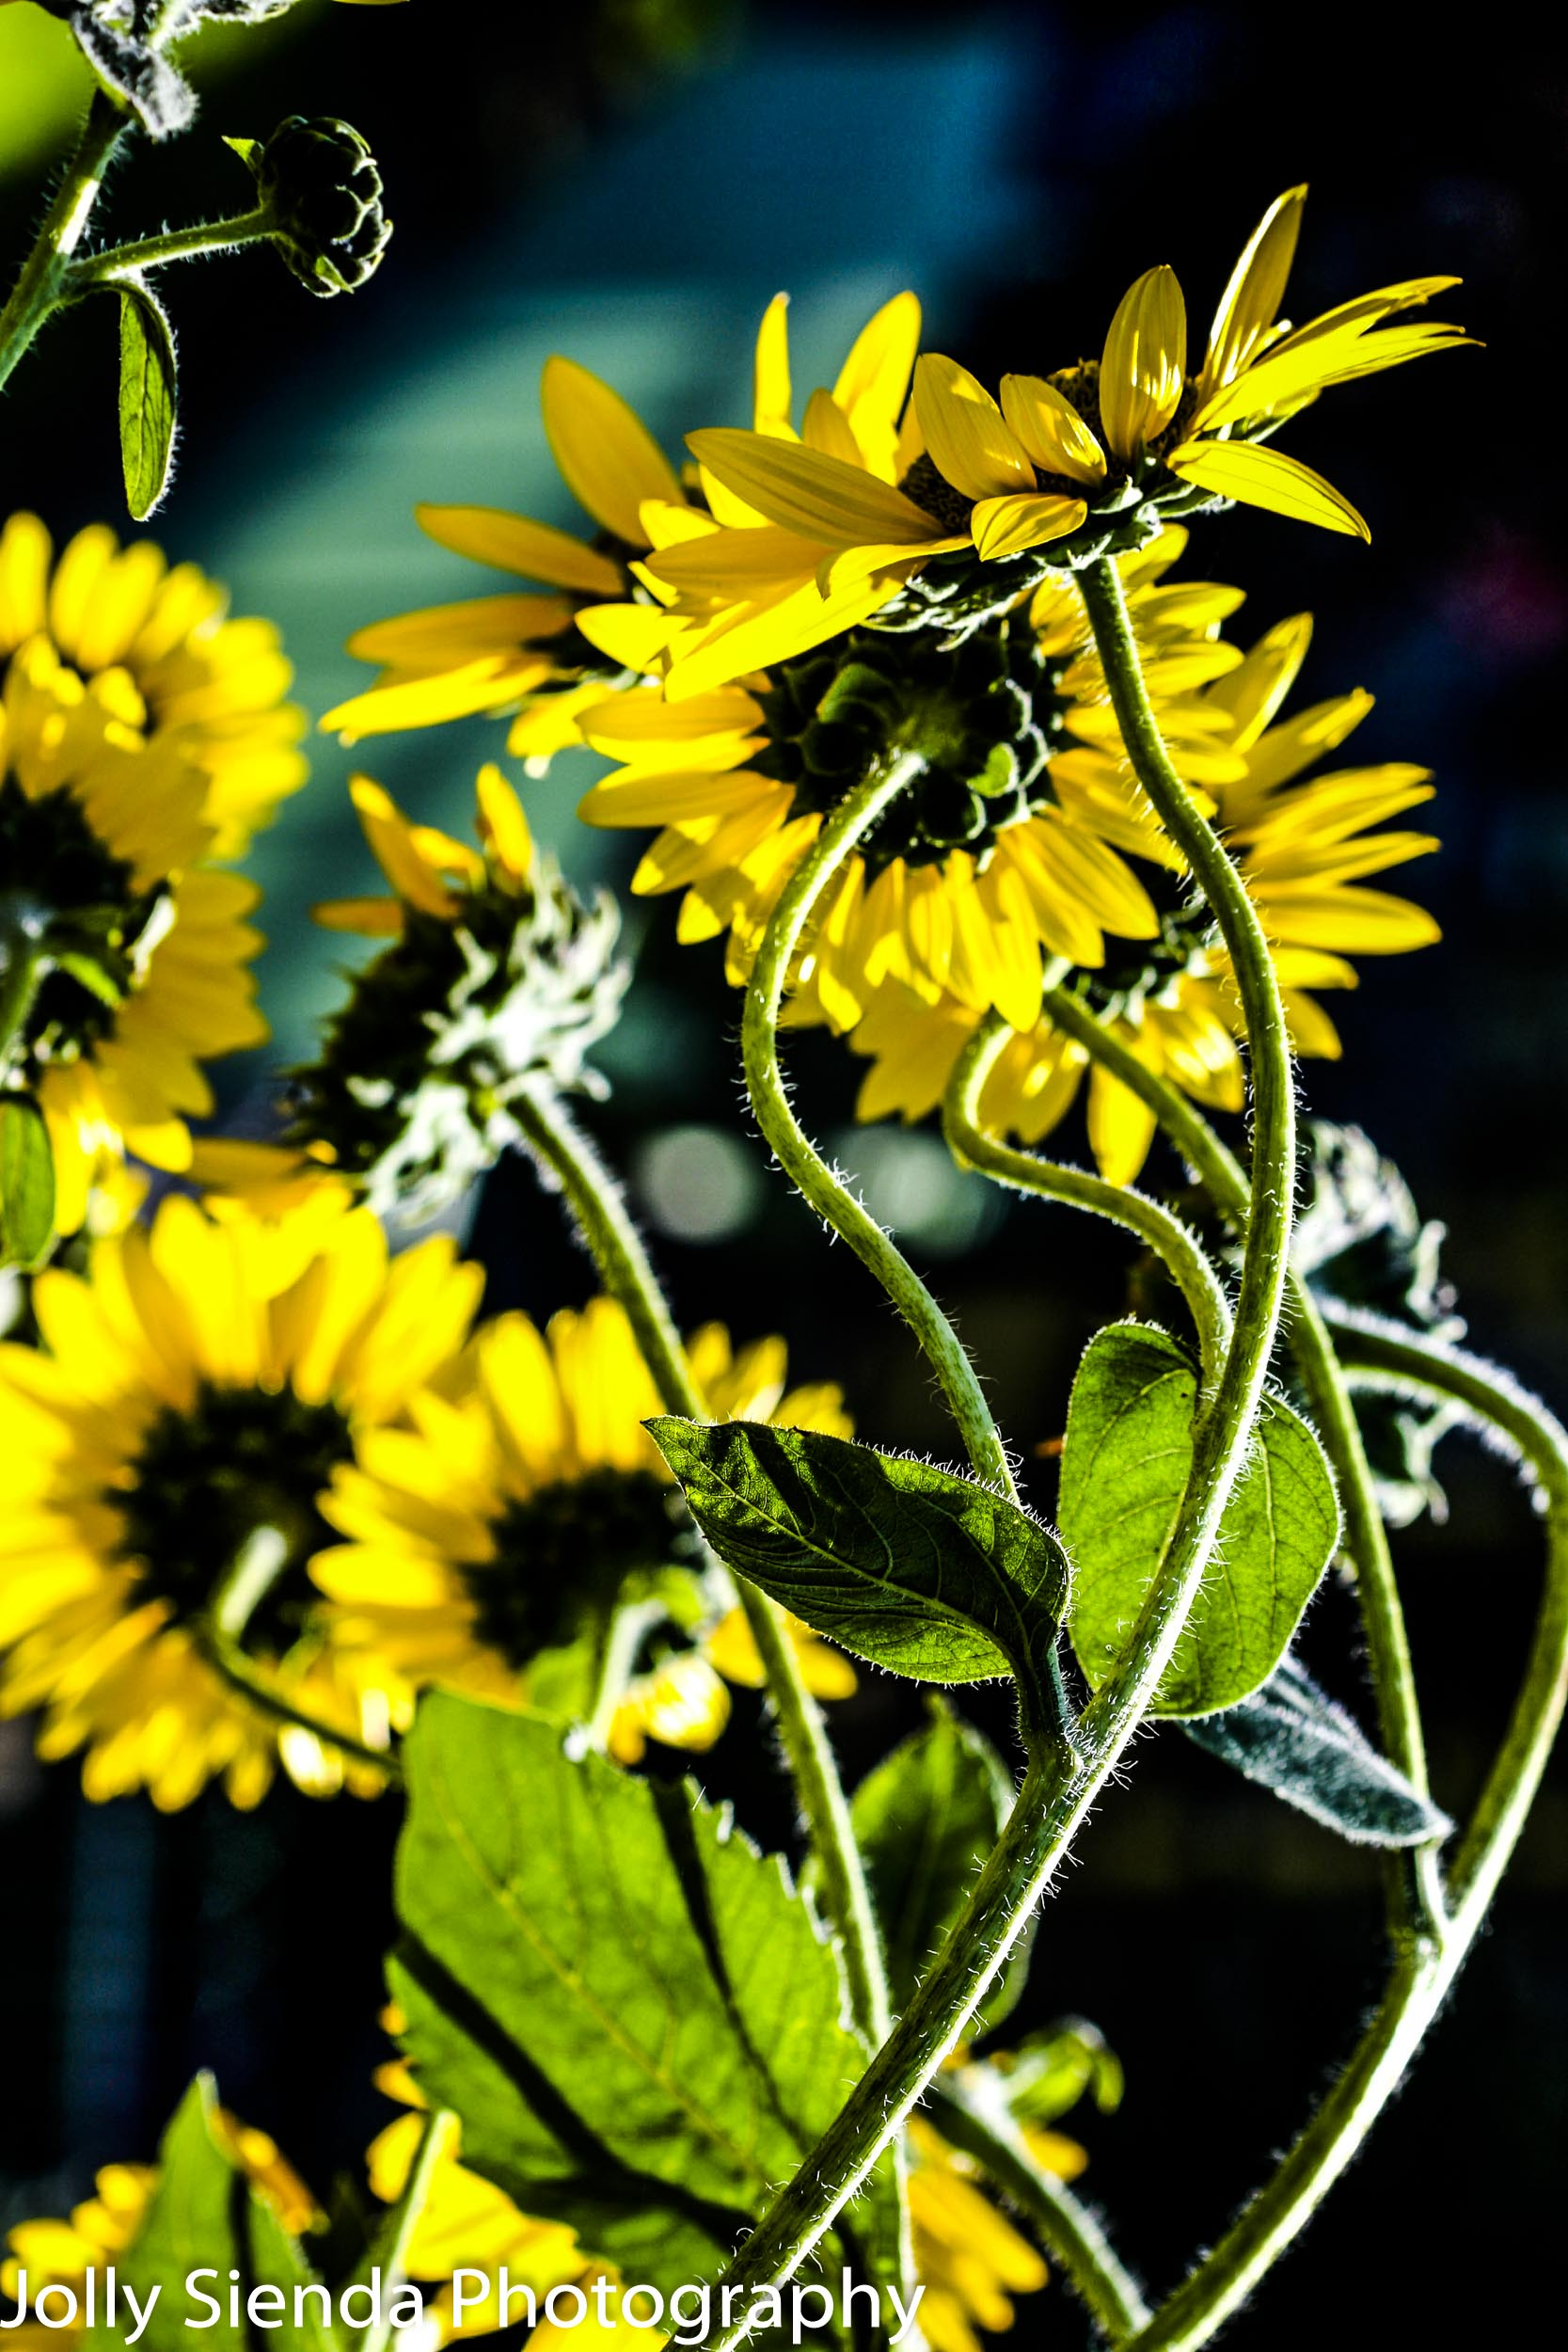 Sunflowers dance in the sunlight